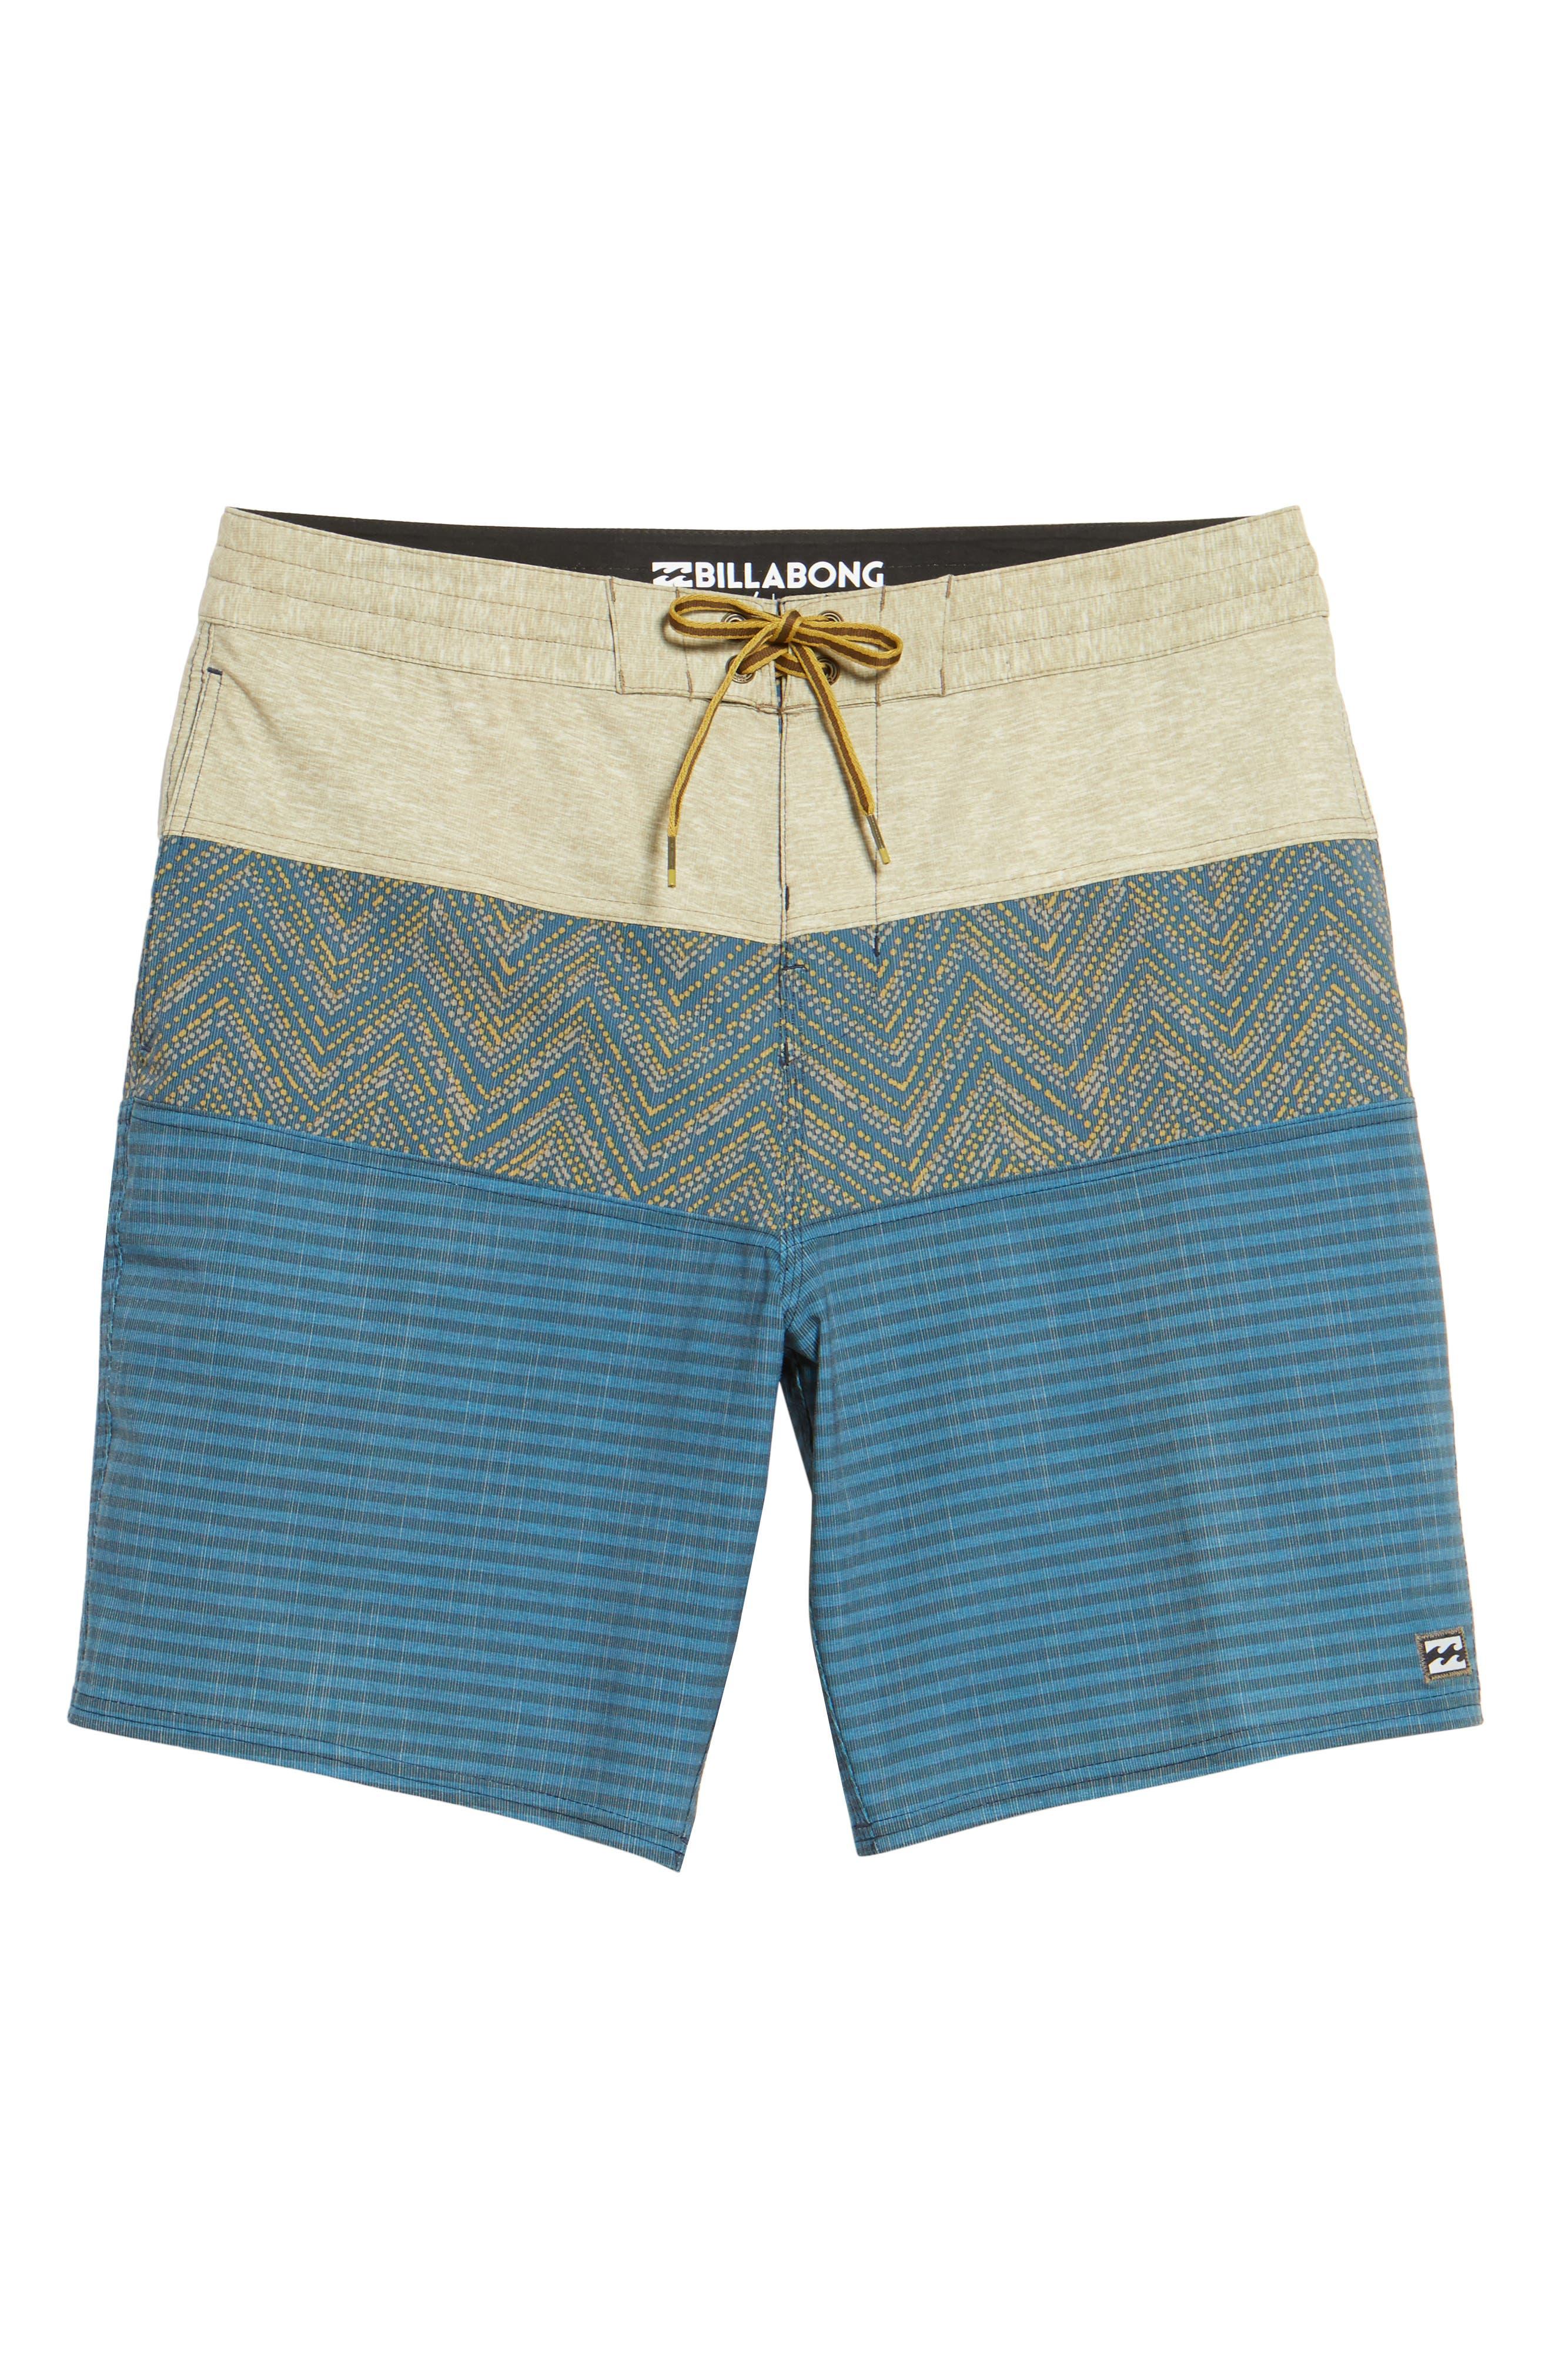 Tribong LT Board Shorts,                             Alternate thumbnail 6, color,                             Dijon